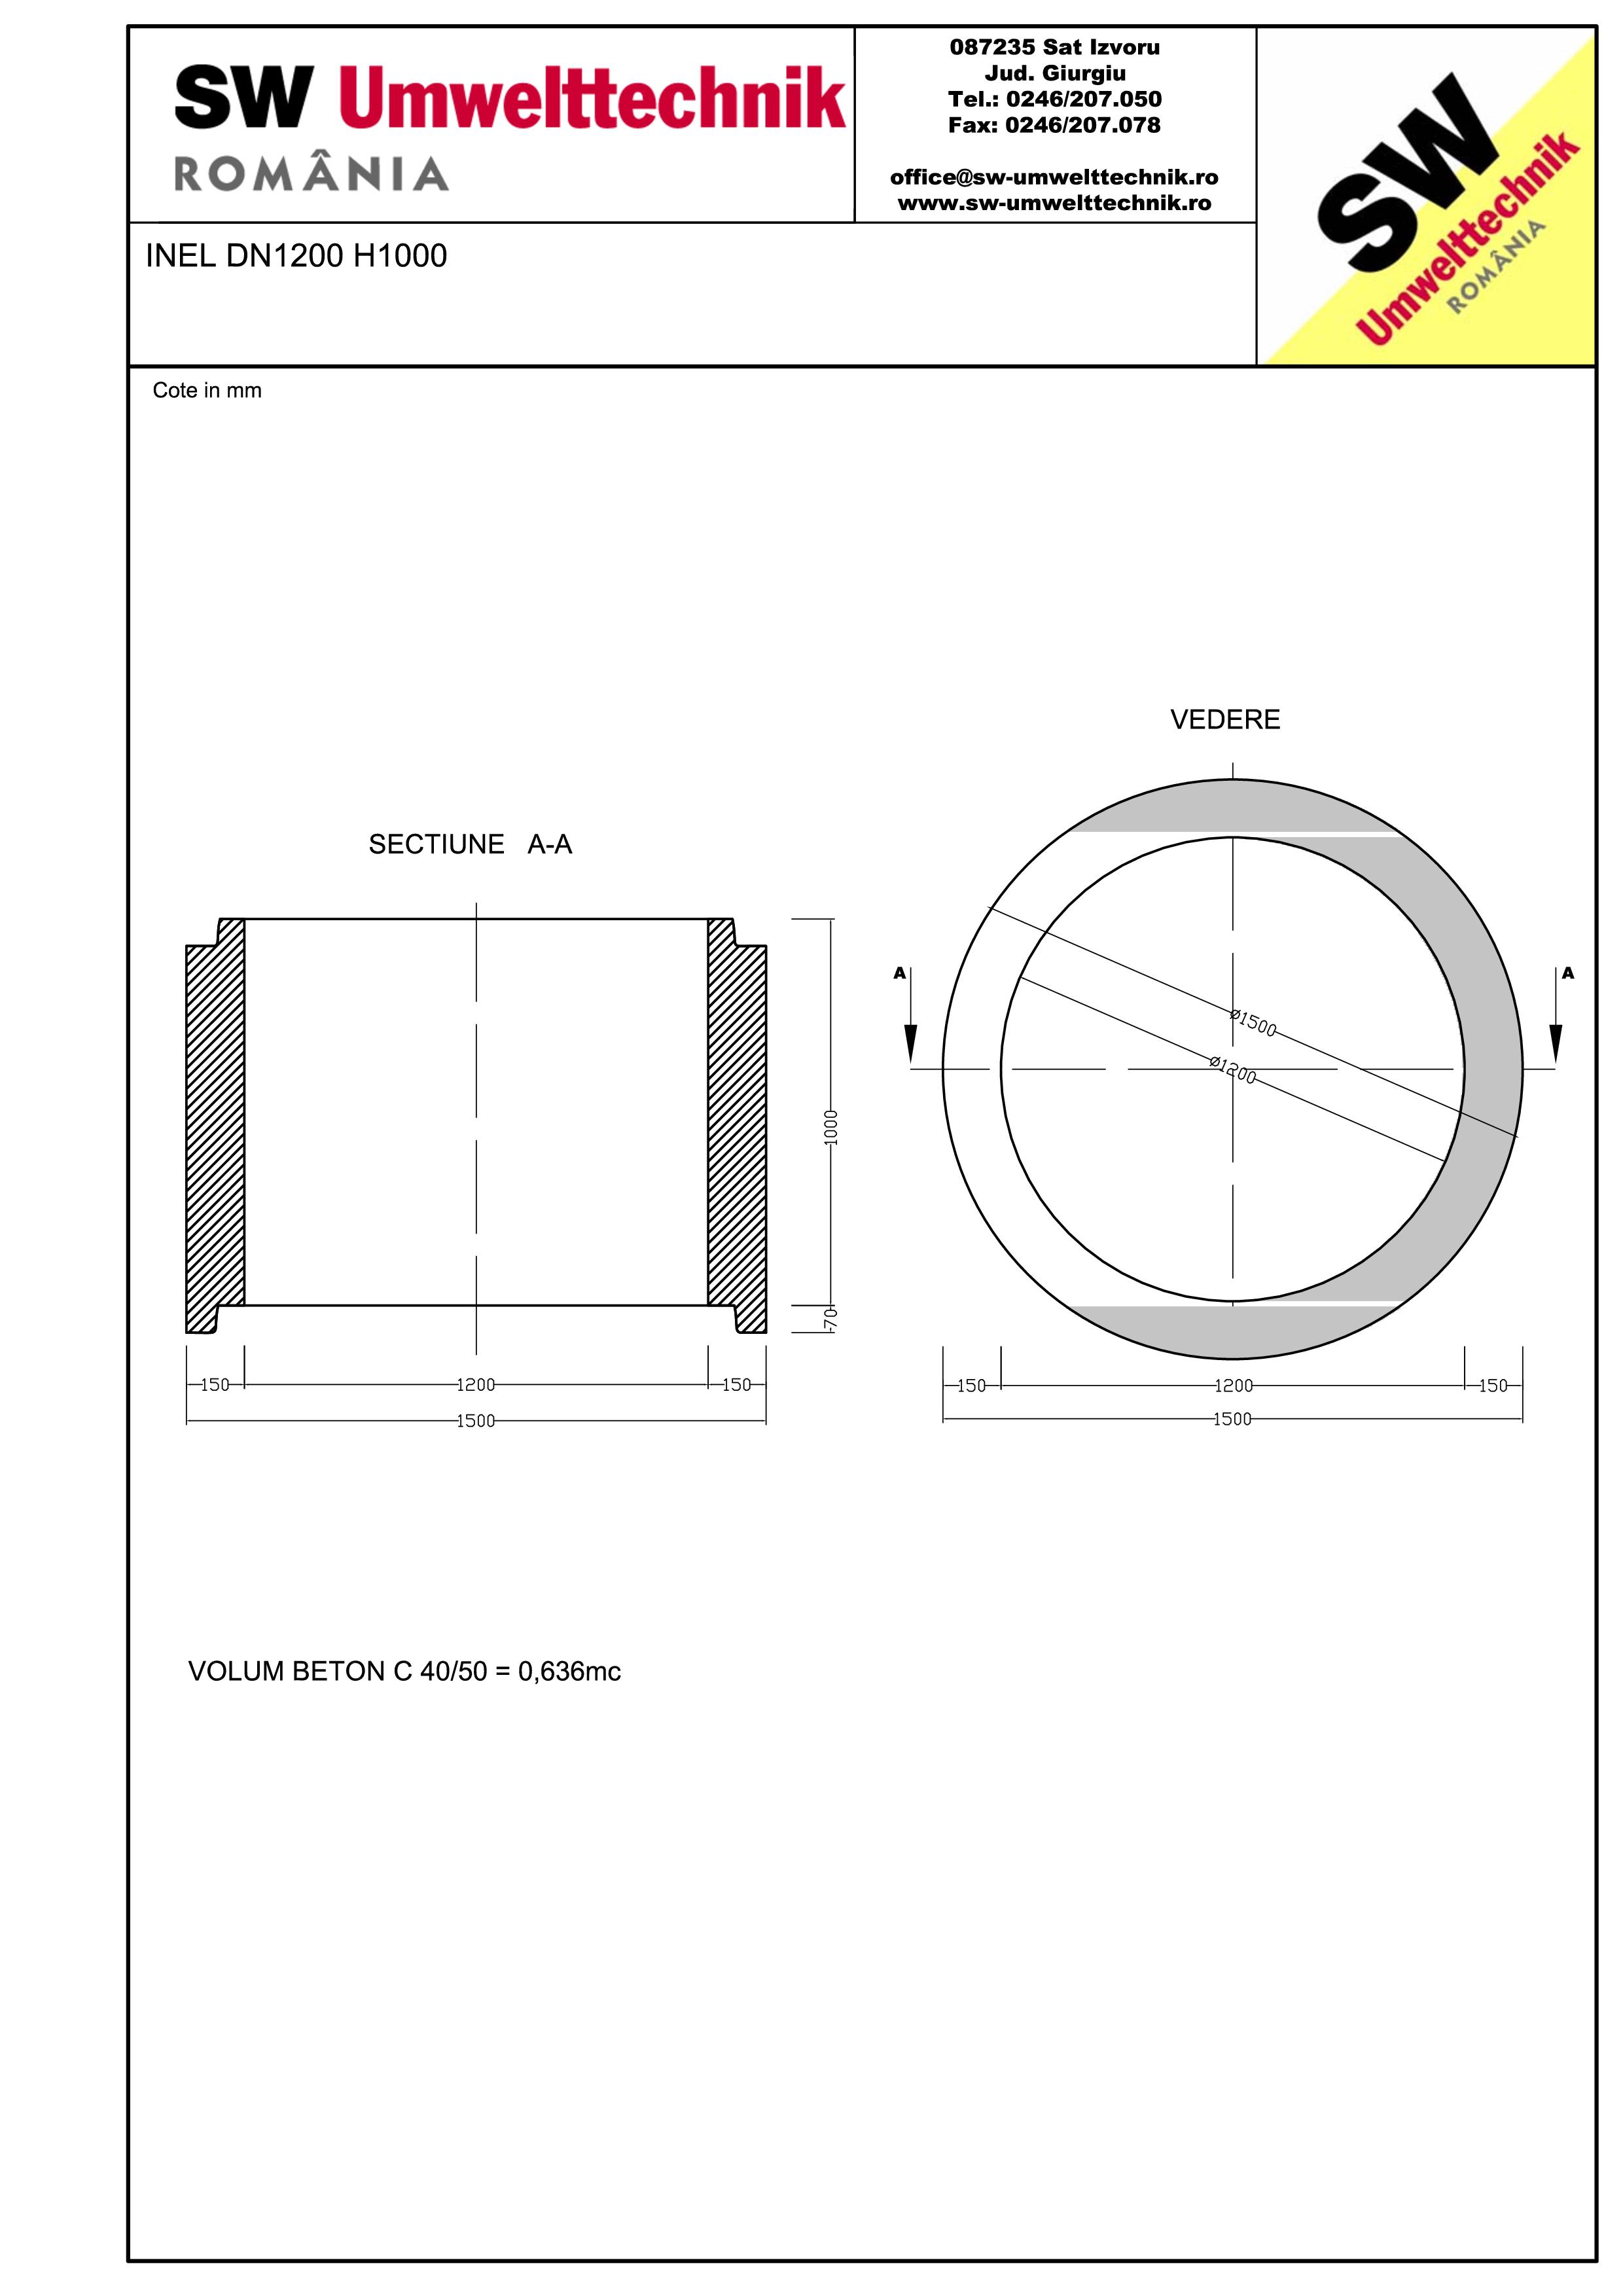 Pagina 1 - CAD-PDF Inel  DN1200 INEL H1000 SW UMWELTTECHNIK Detaliu de produs